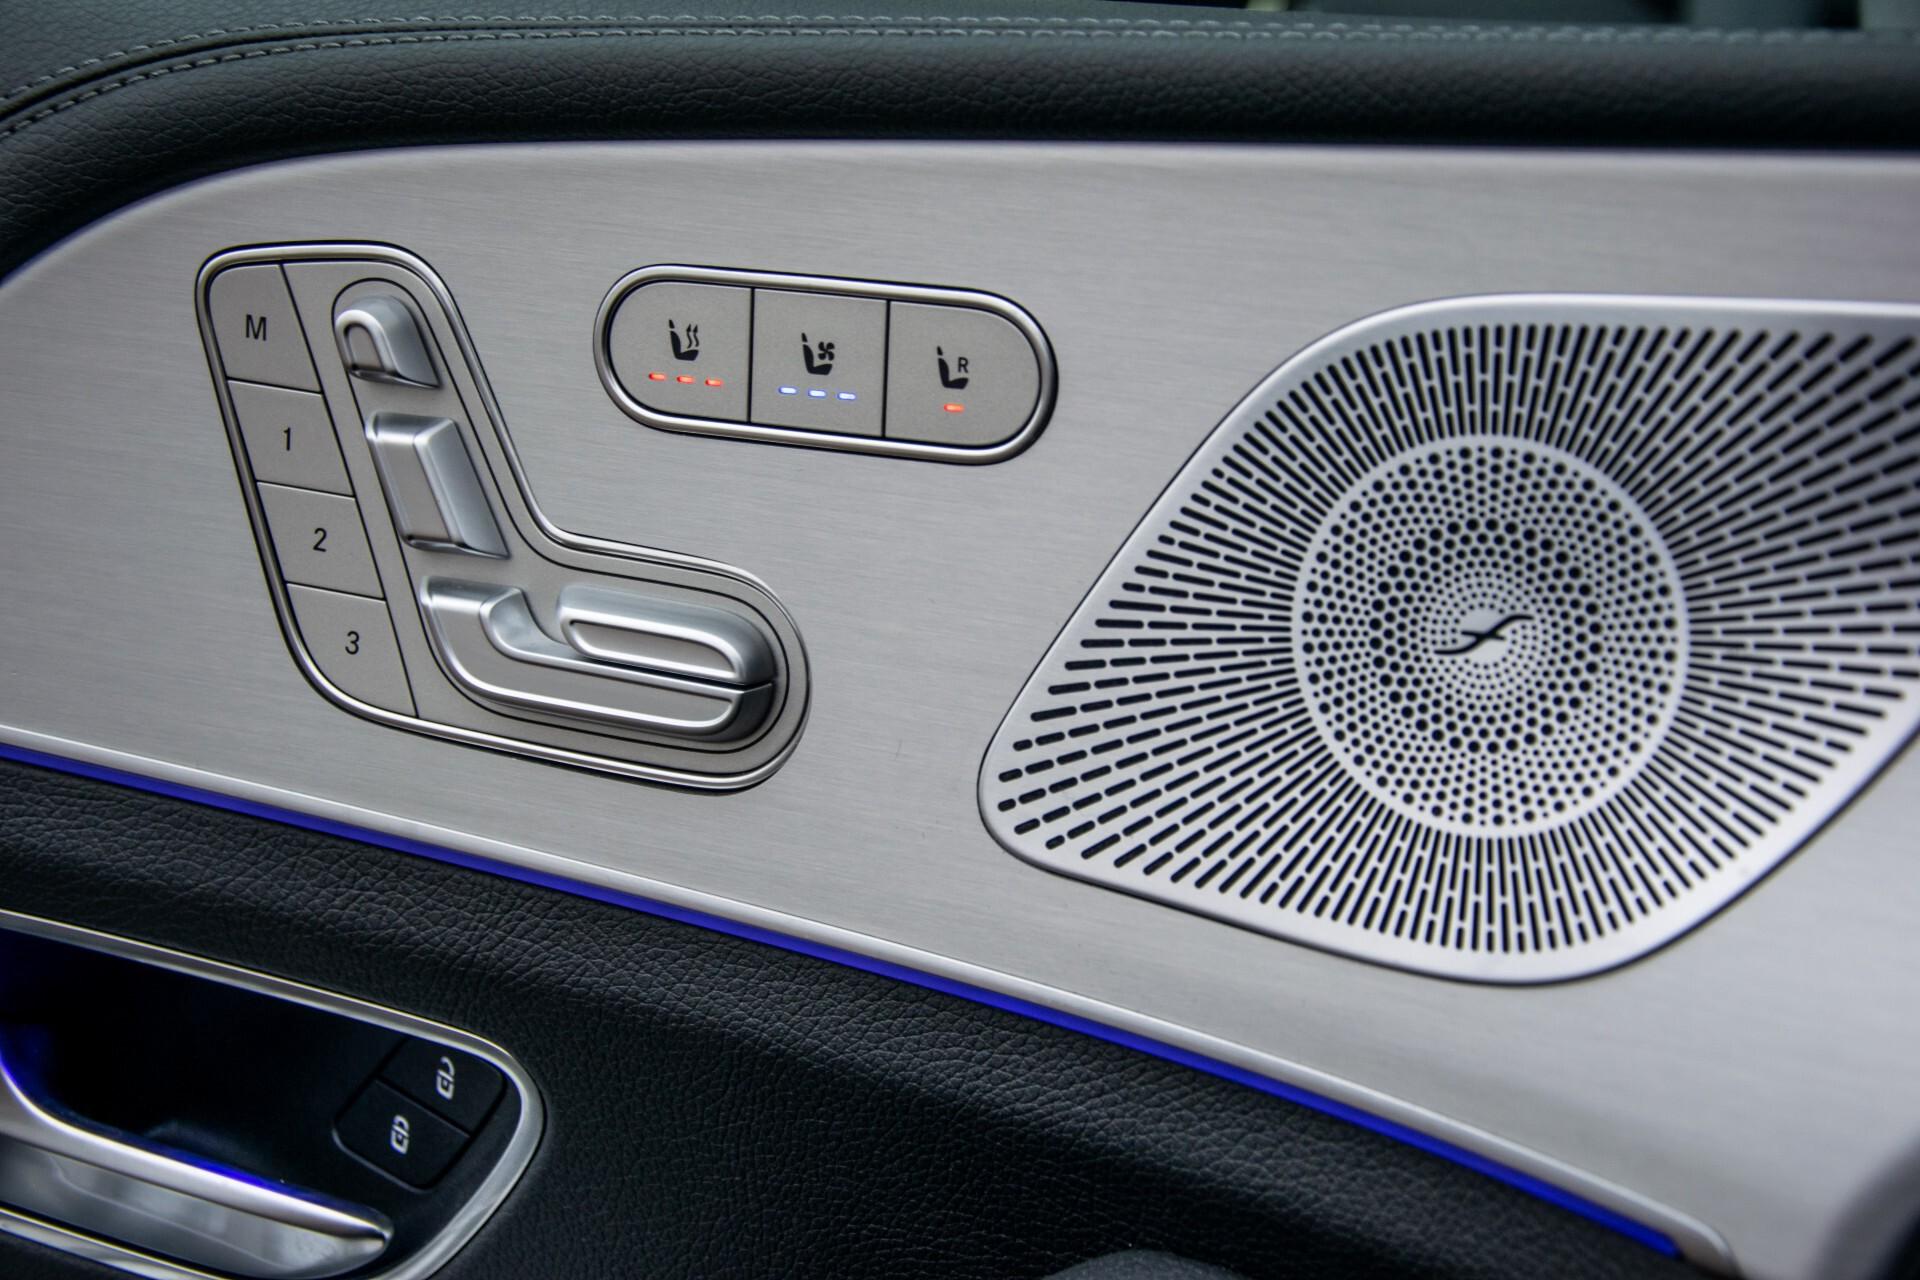 Mercedes-Benz GLE 450 4-M 7-Persoons AMG Massage/Rij-assist/Keyless/TV/360/Night/Trekhaak Aut9 Foto 33